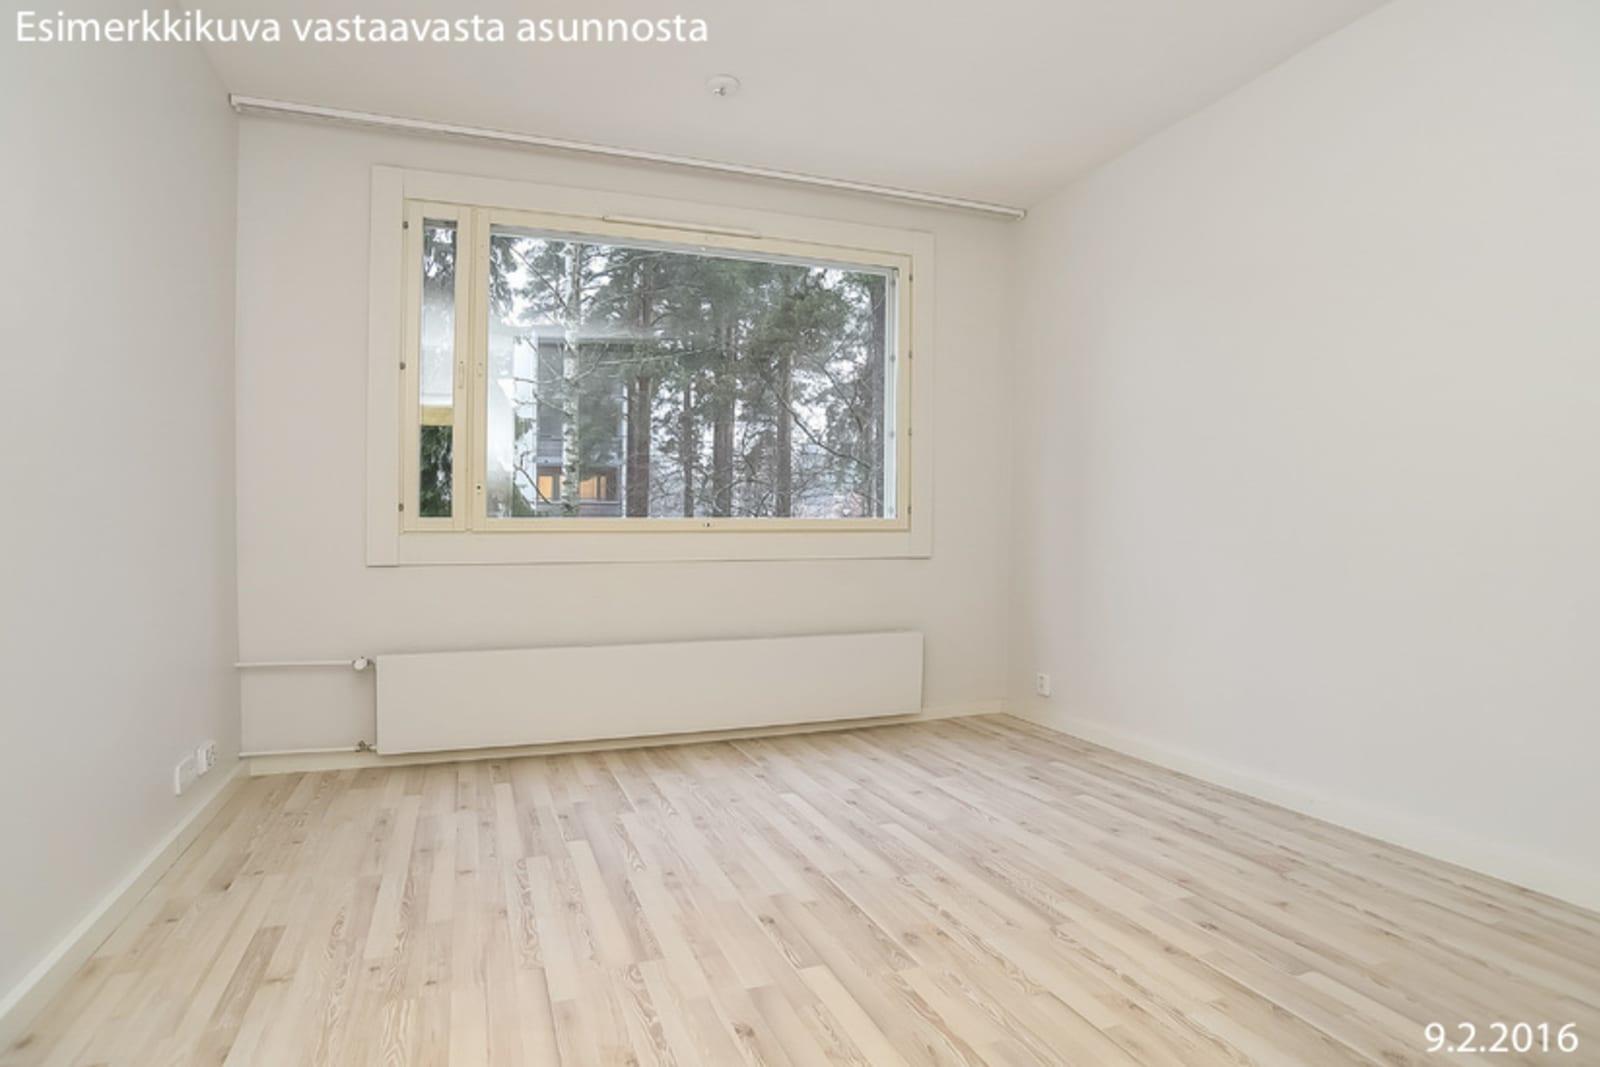 Espoo, Laajalahti, Heinjoenpolku 2 G-J J 064